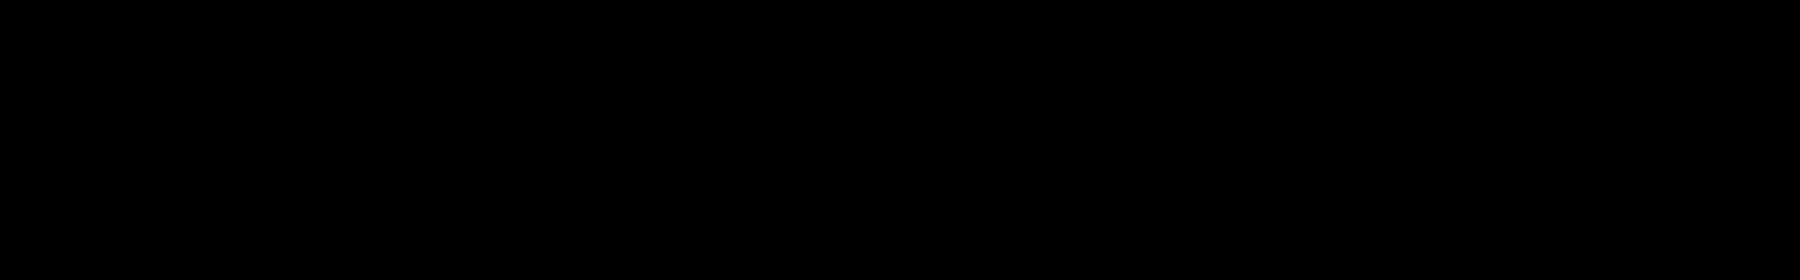 XLR8 audio waveform